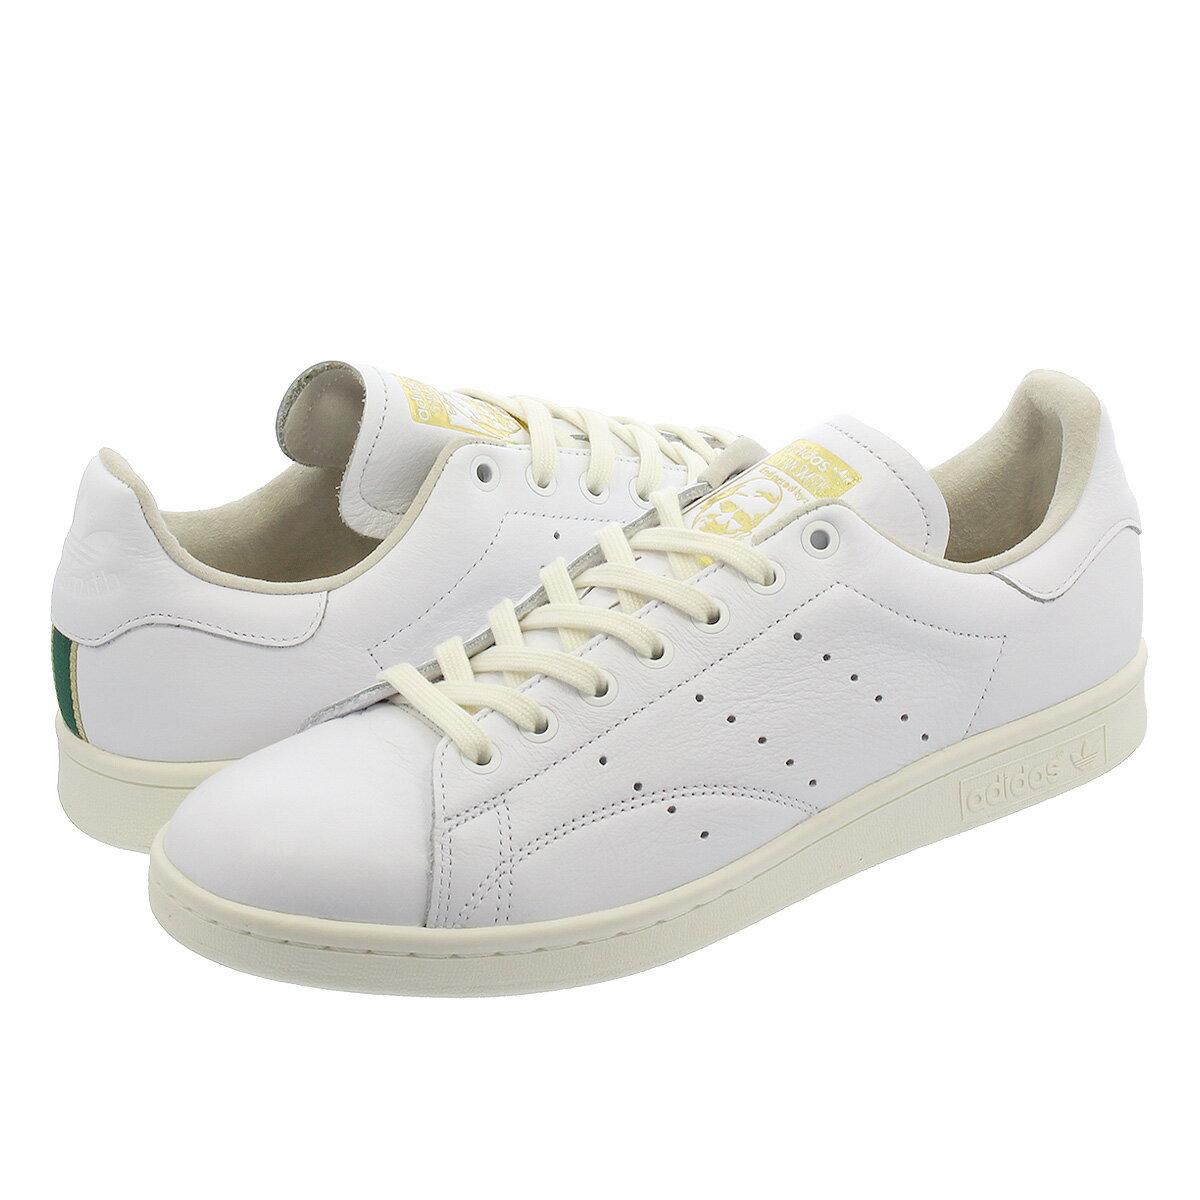 adidas STAN SMITH 【adidas Originals】【メンズ】【レディース】 アディダス スタンスミス RUNNING WHITE/OFF WHITE/COLLEGIATE GREEN db3527